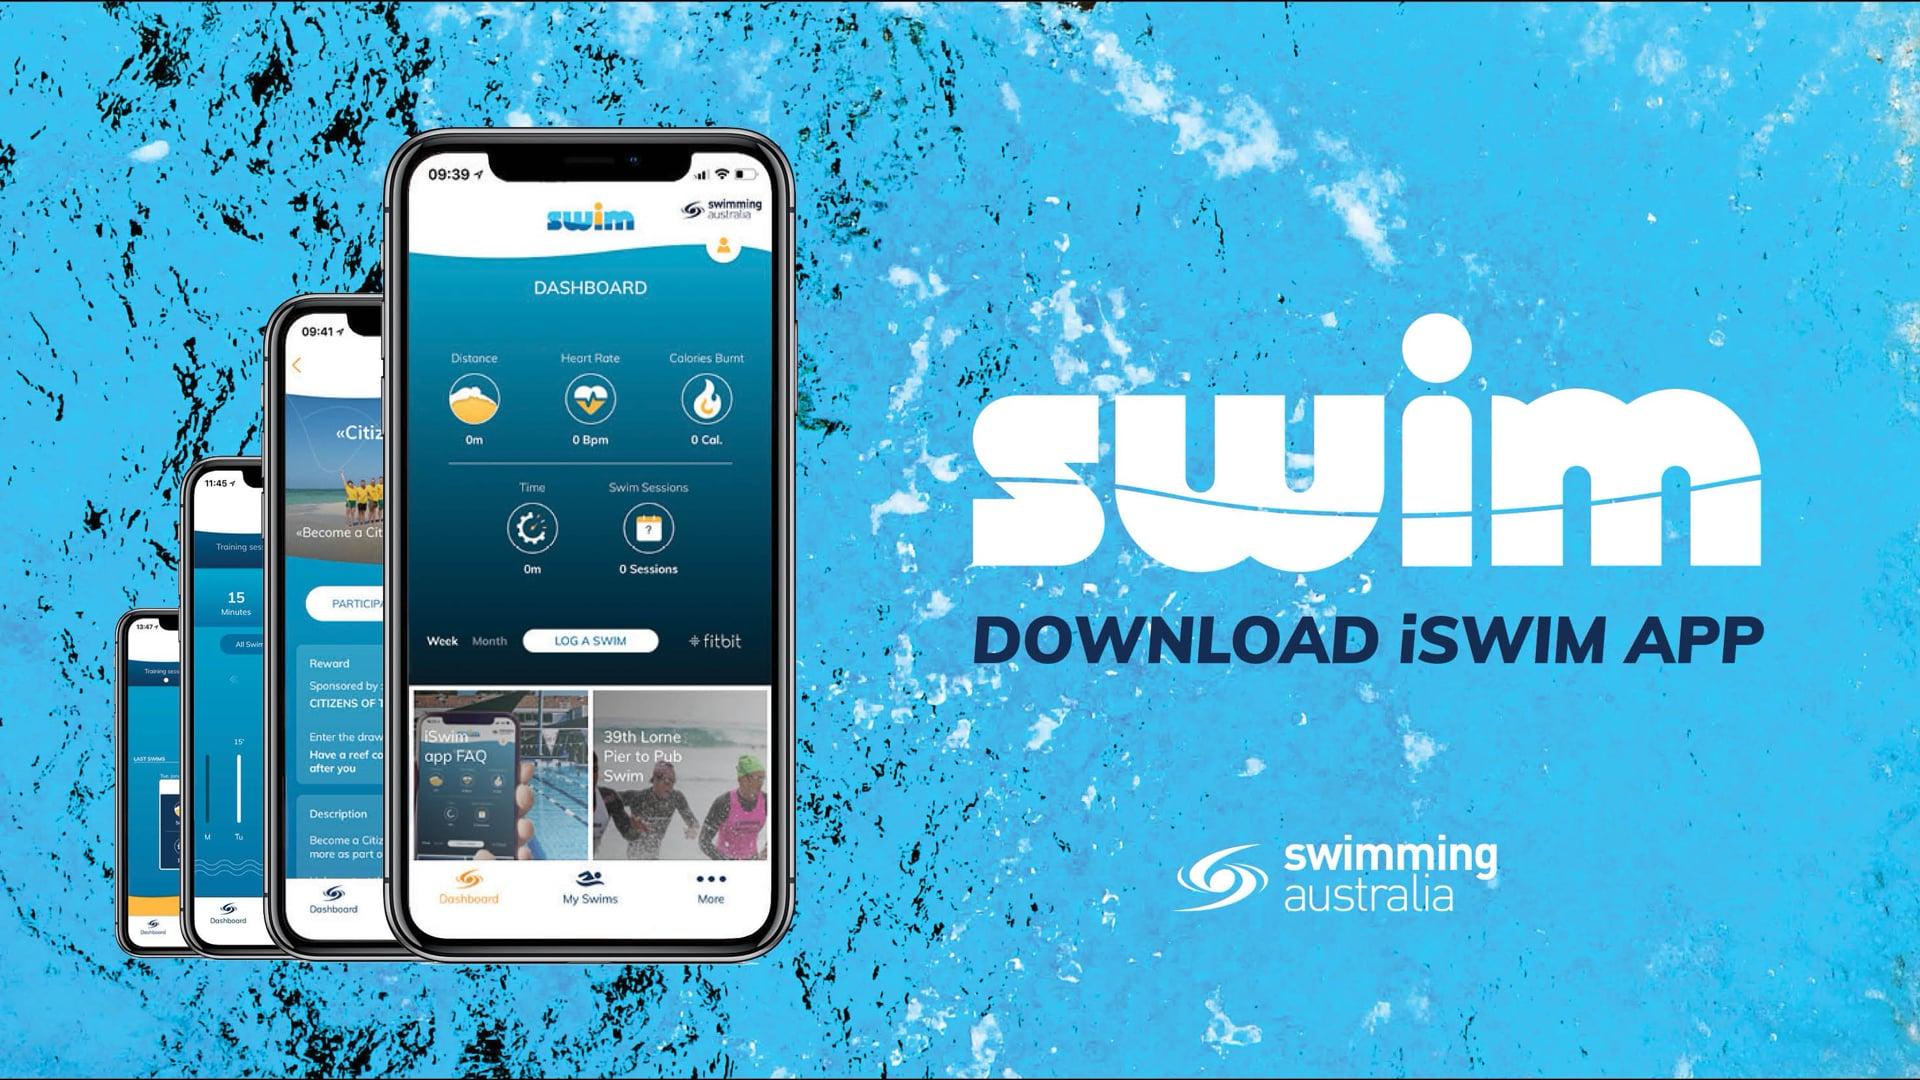 Introducing iSwim